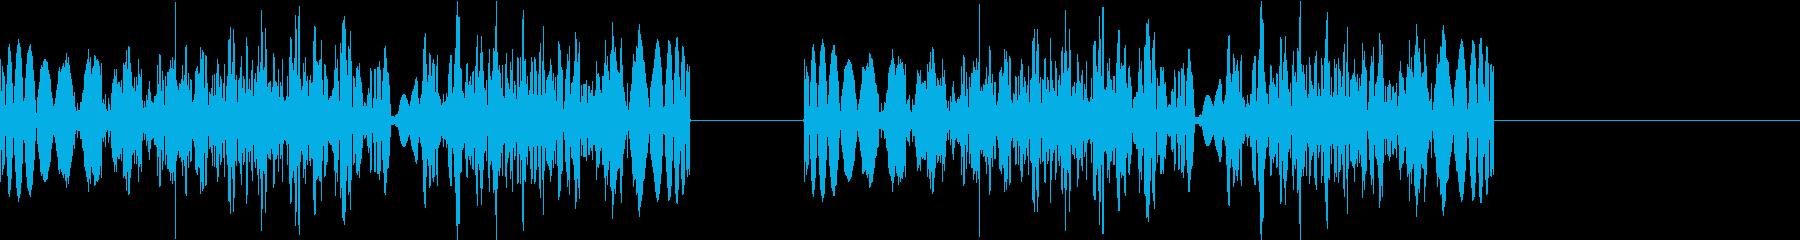 DJプレイ スクラッチ・ノイズ 309の再生済みの波形